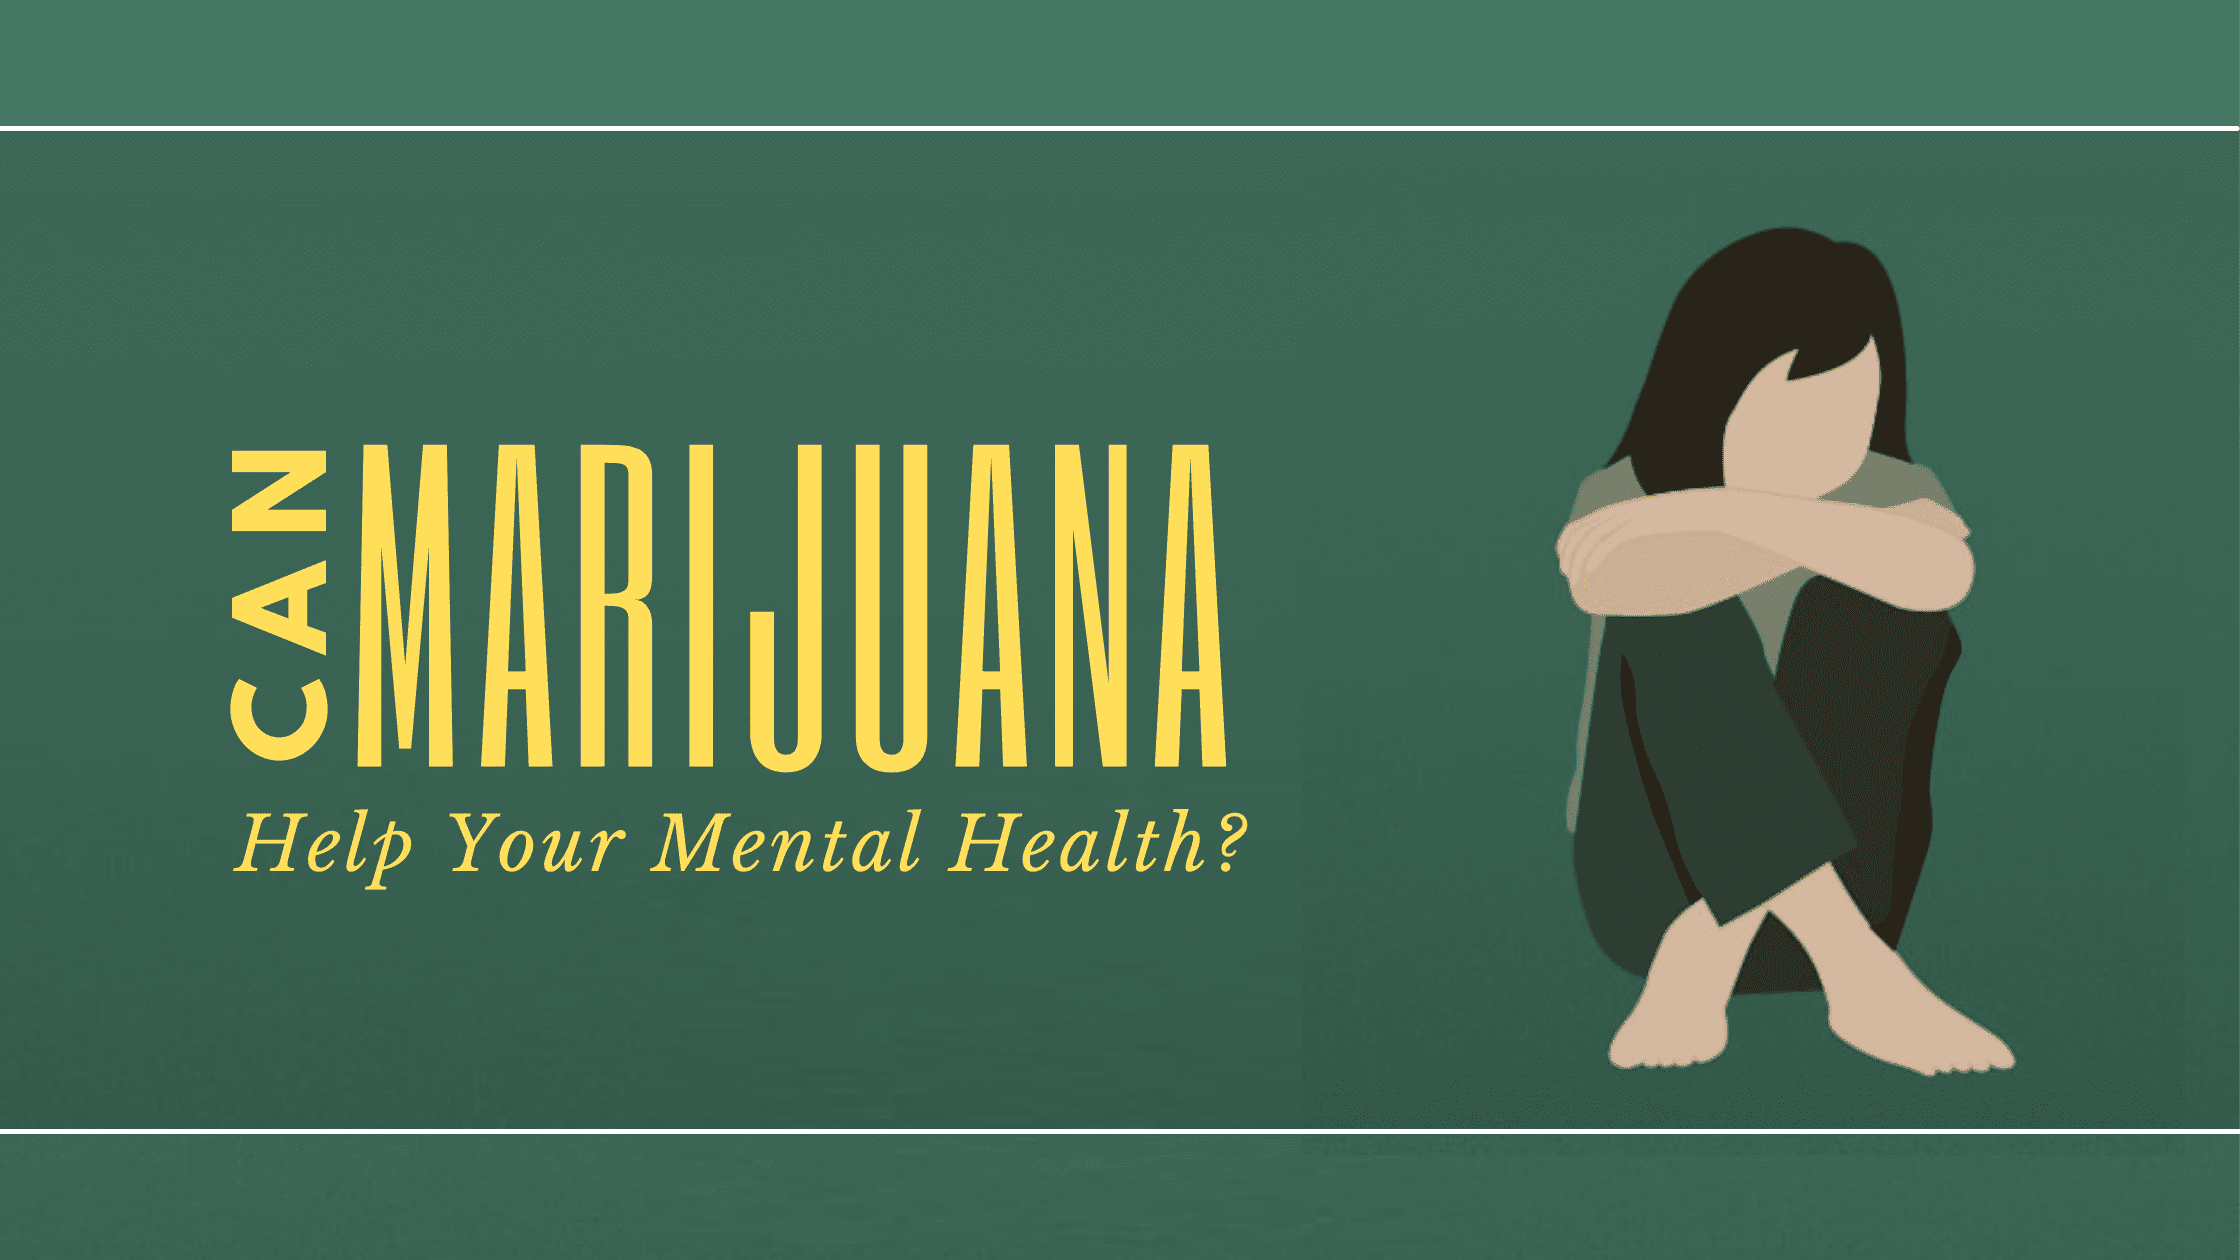 Top Mental Health Conditions Medical Marijuana Can Help